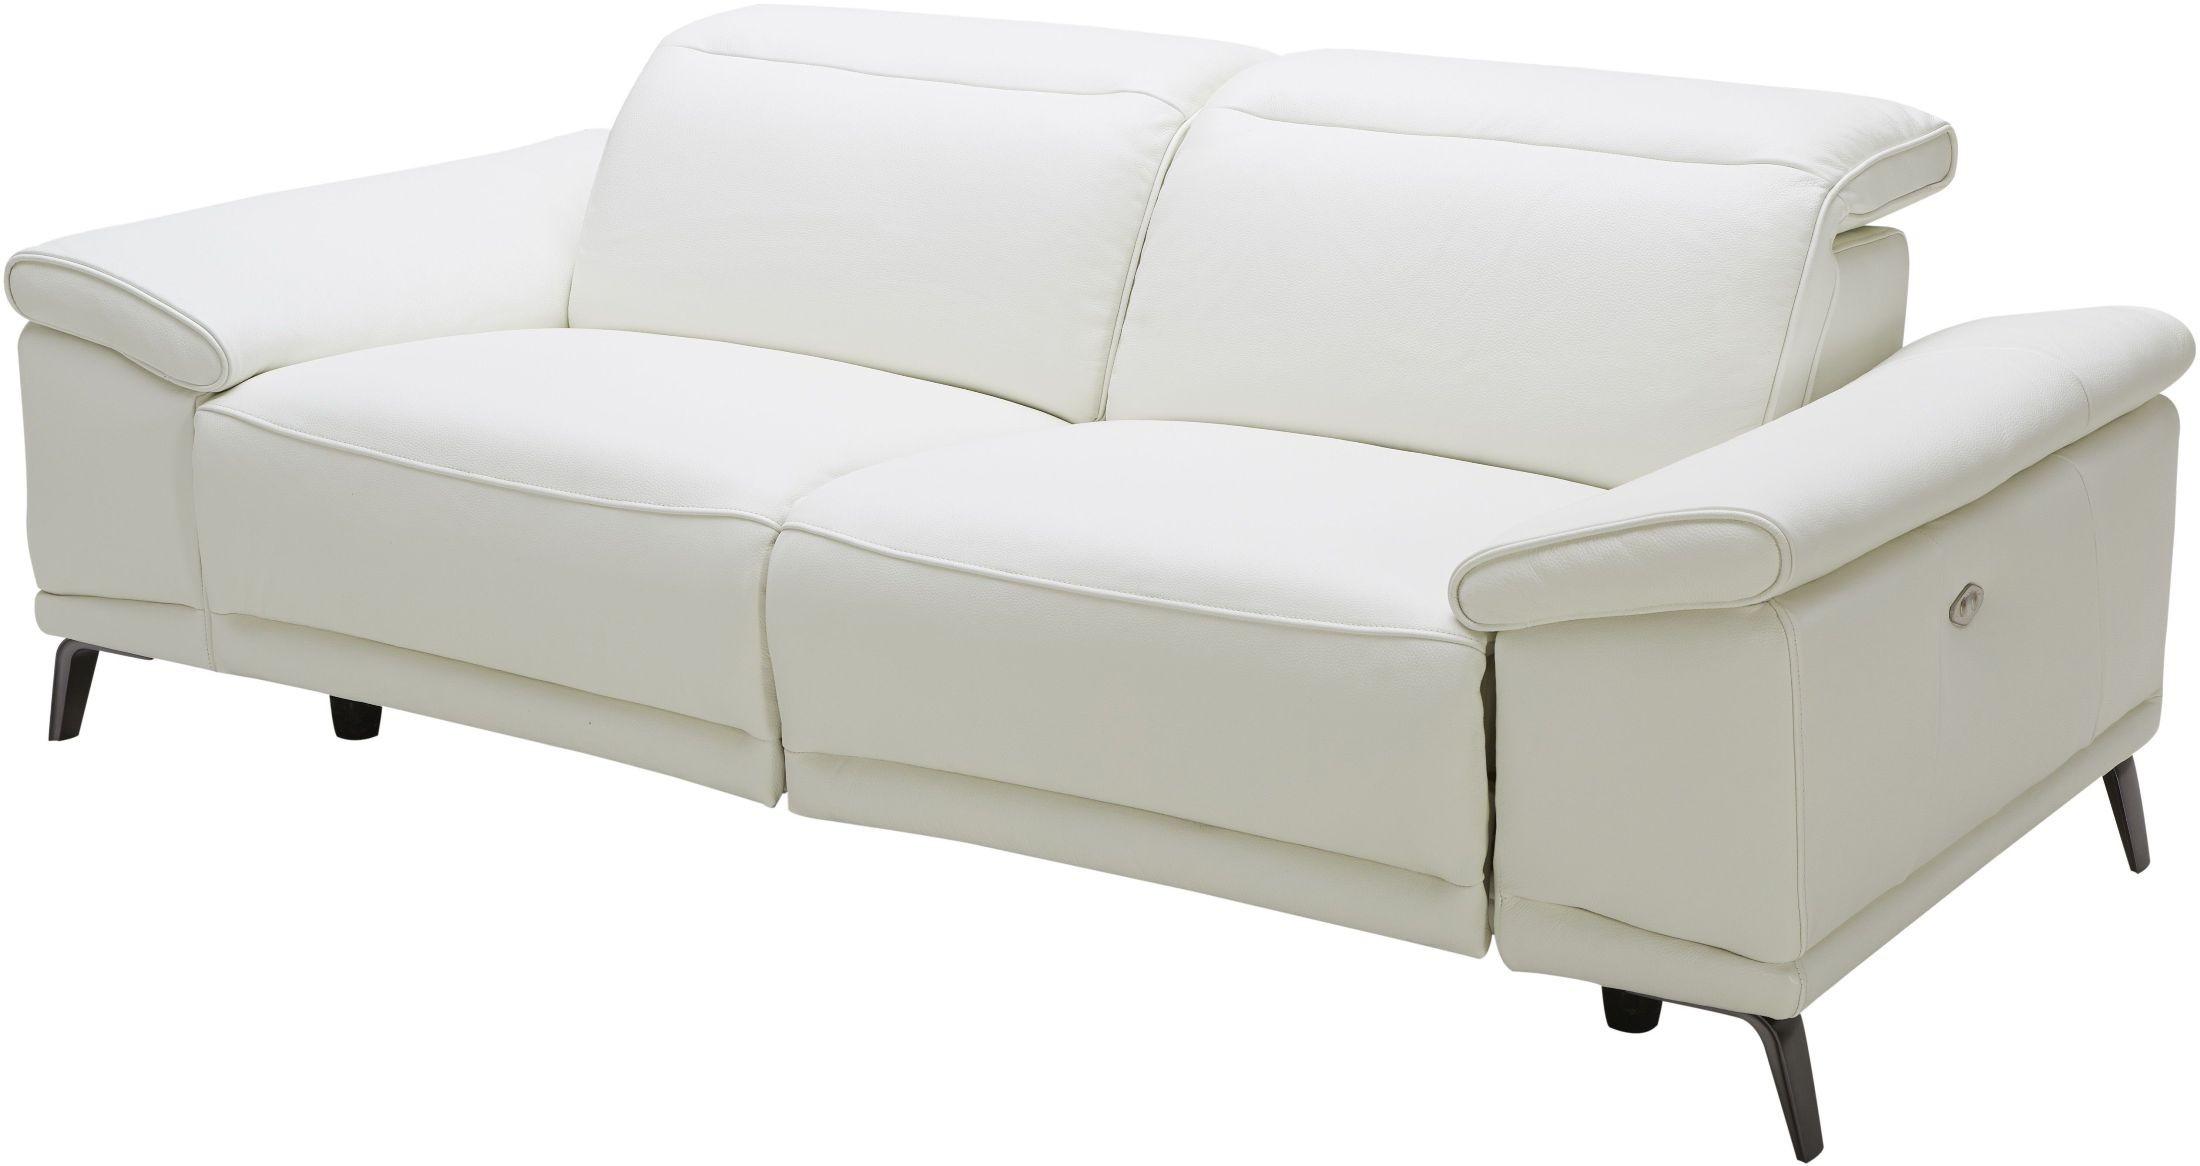 Gaia White Leather Power Reclining Sofa 18253 S JampM